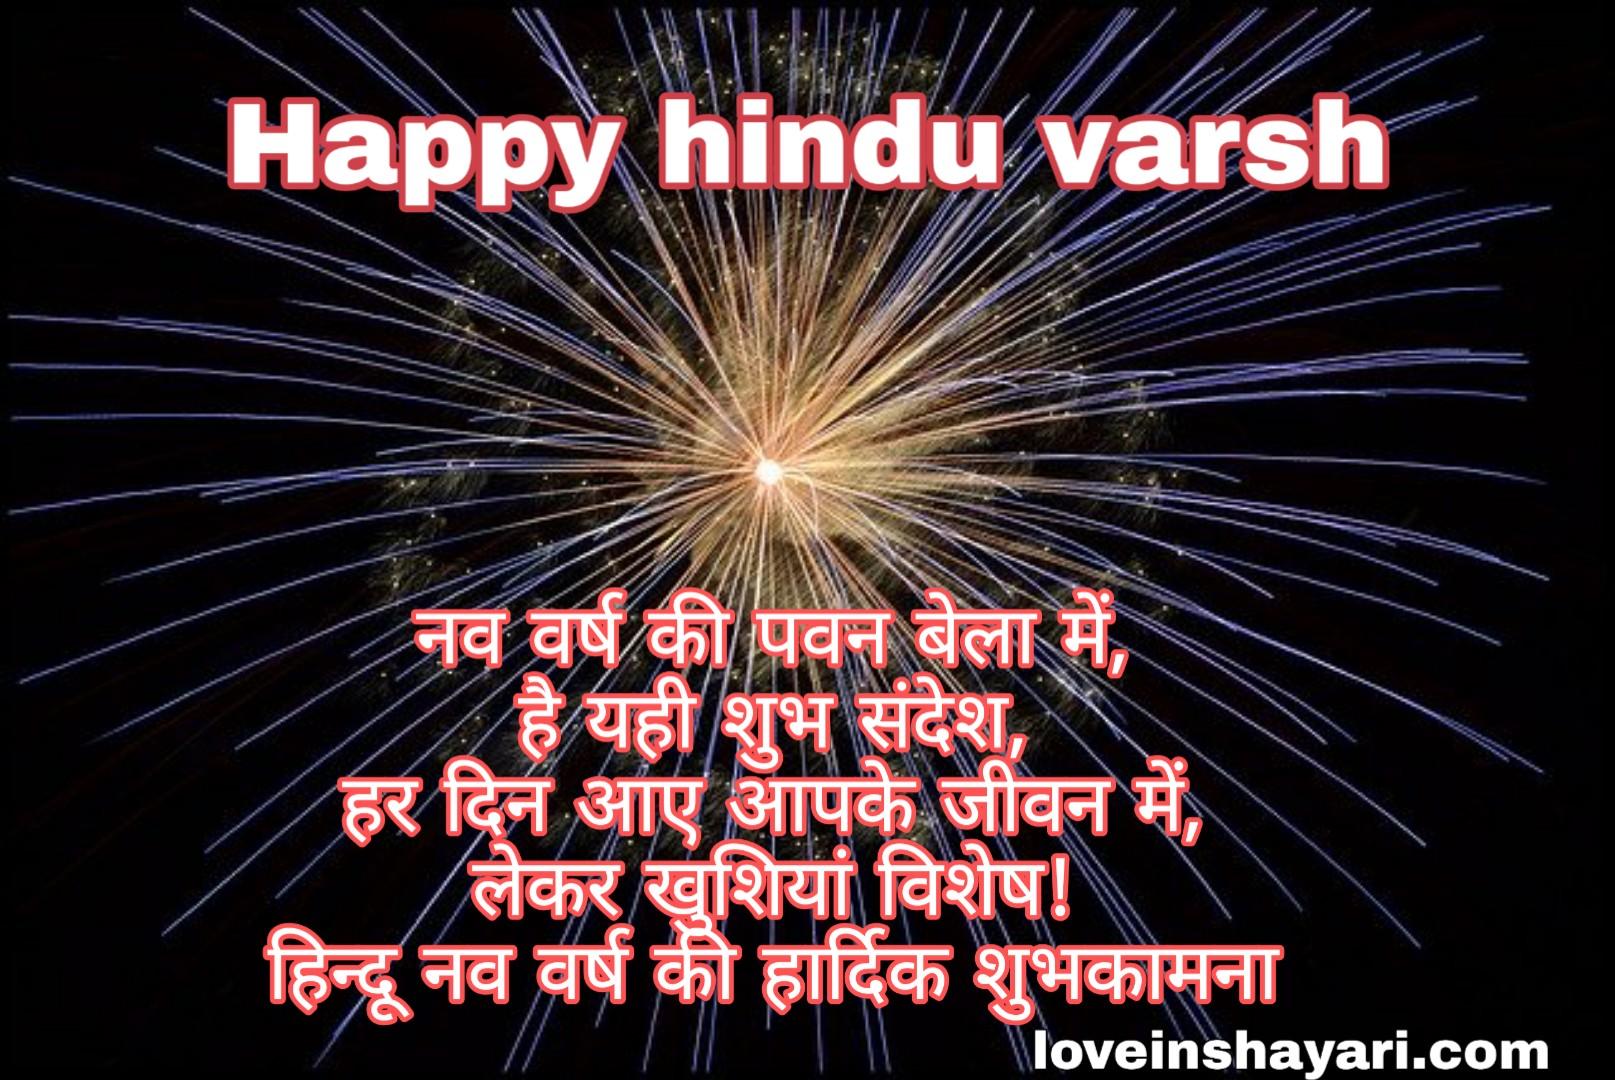 Hindu nav varsh wishes shayari images quotes